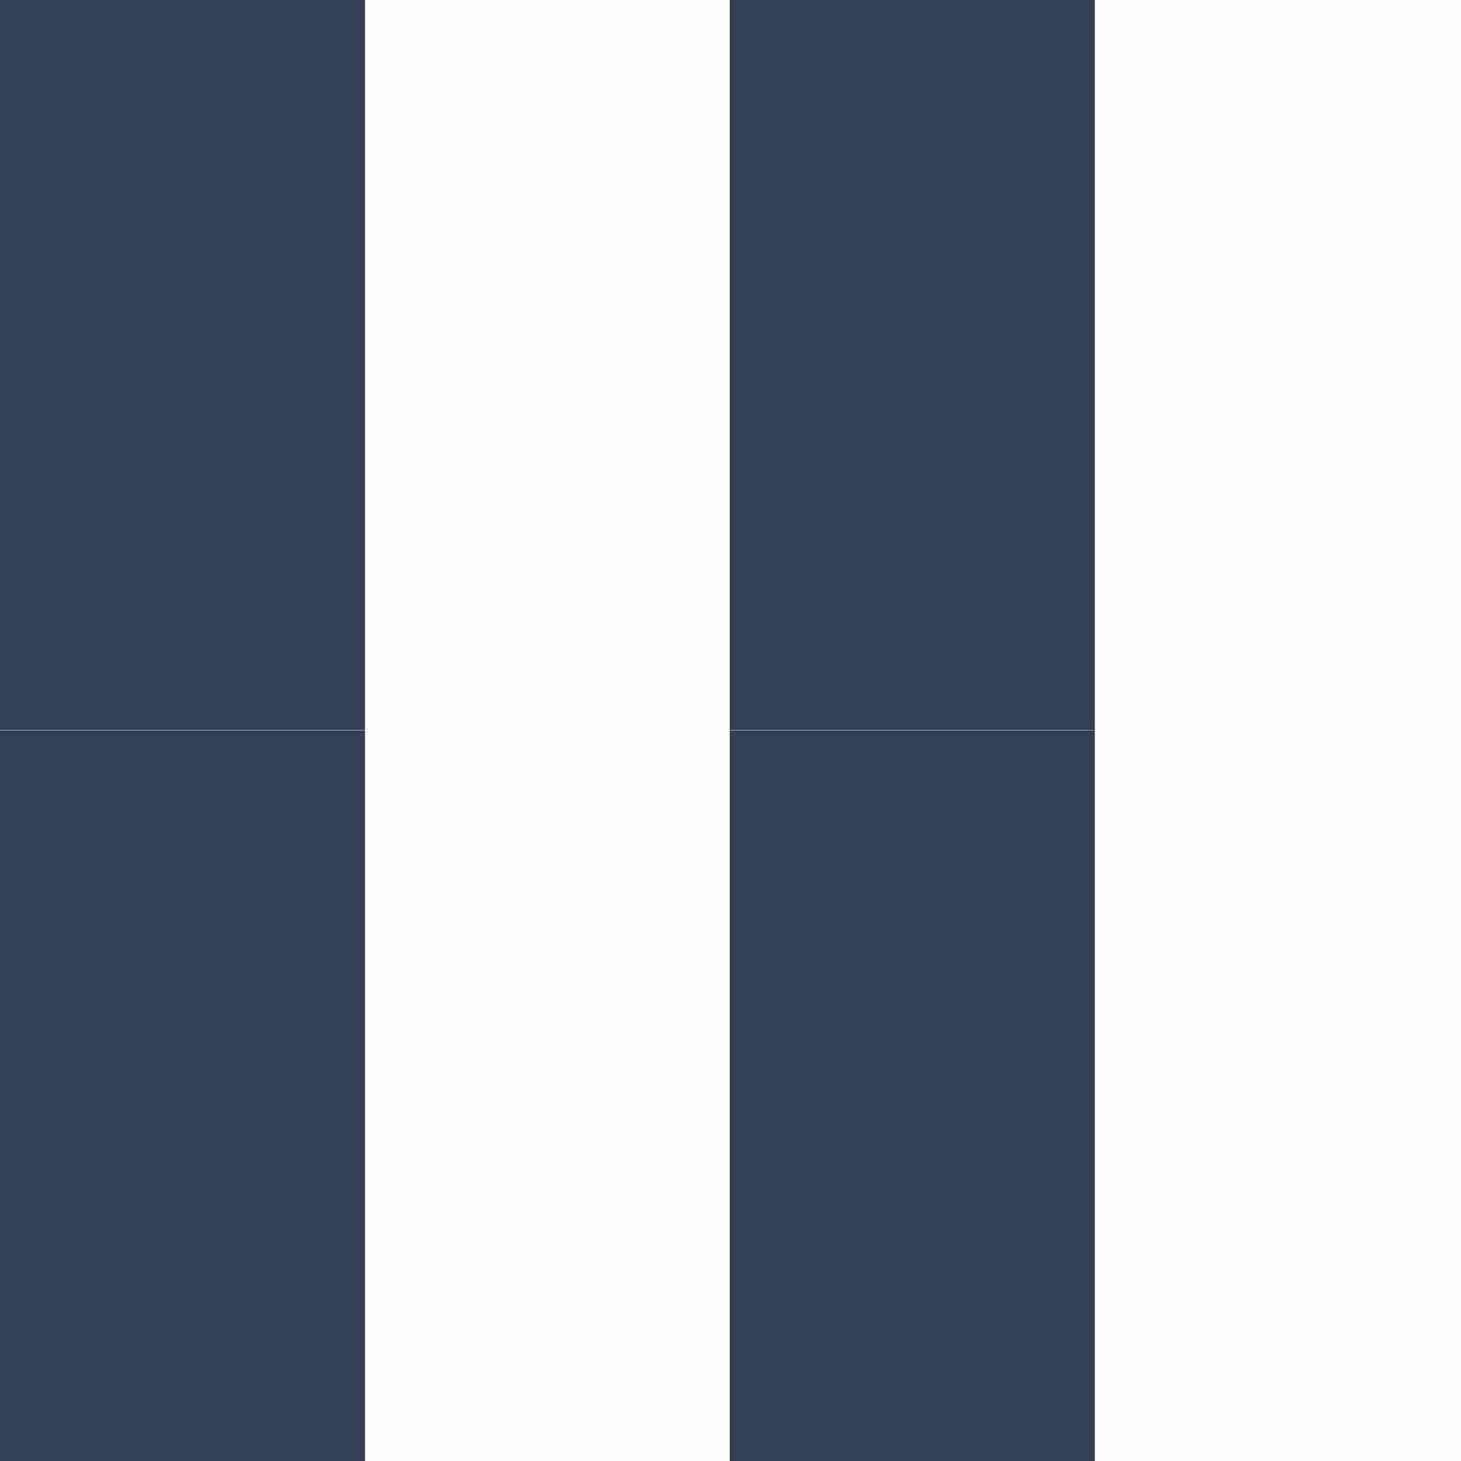 Essener Tapete Simply Stripes 3 Sh34556 bluee Stripes Striped Vinyl Wallpaper